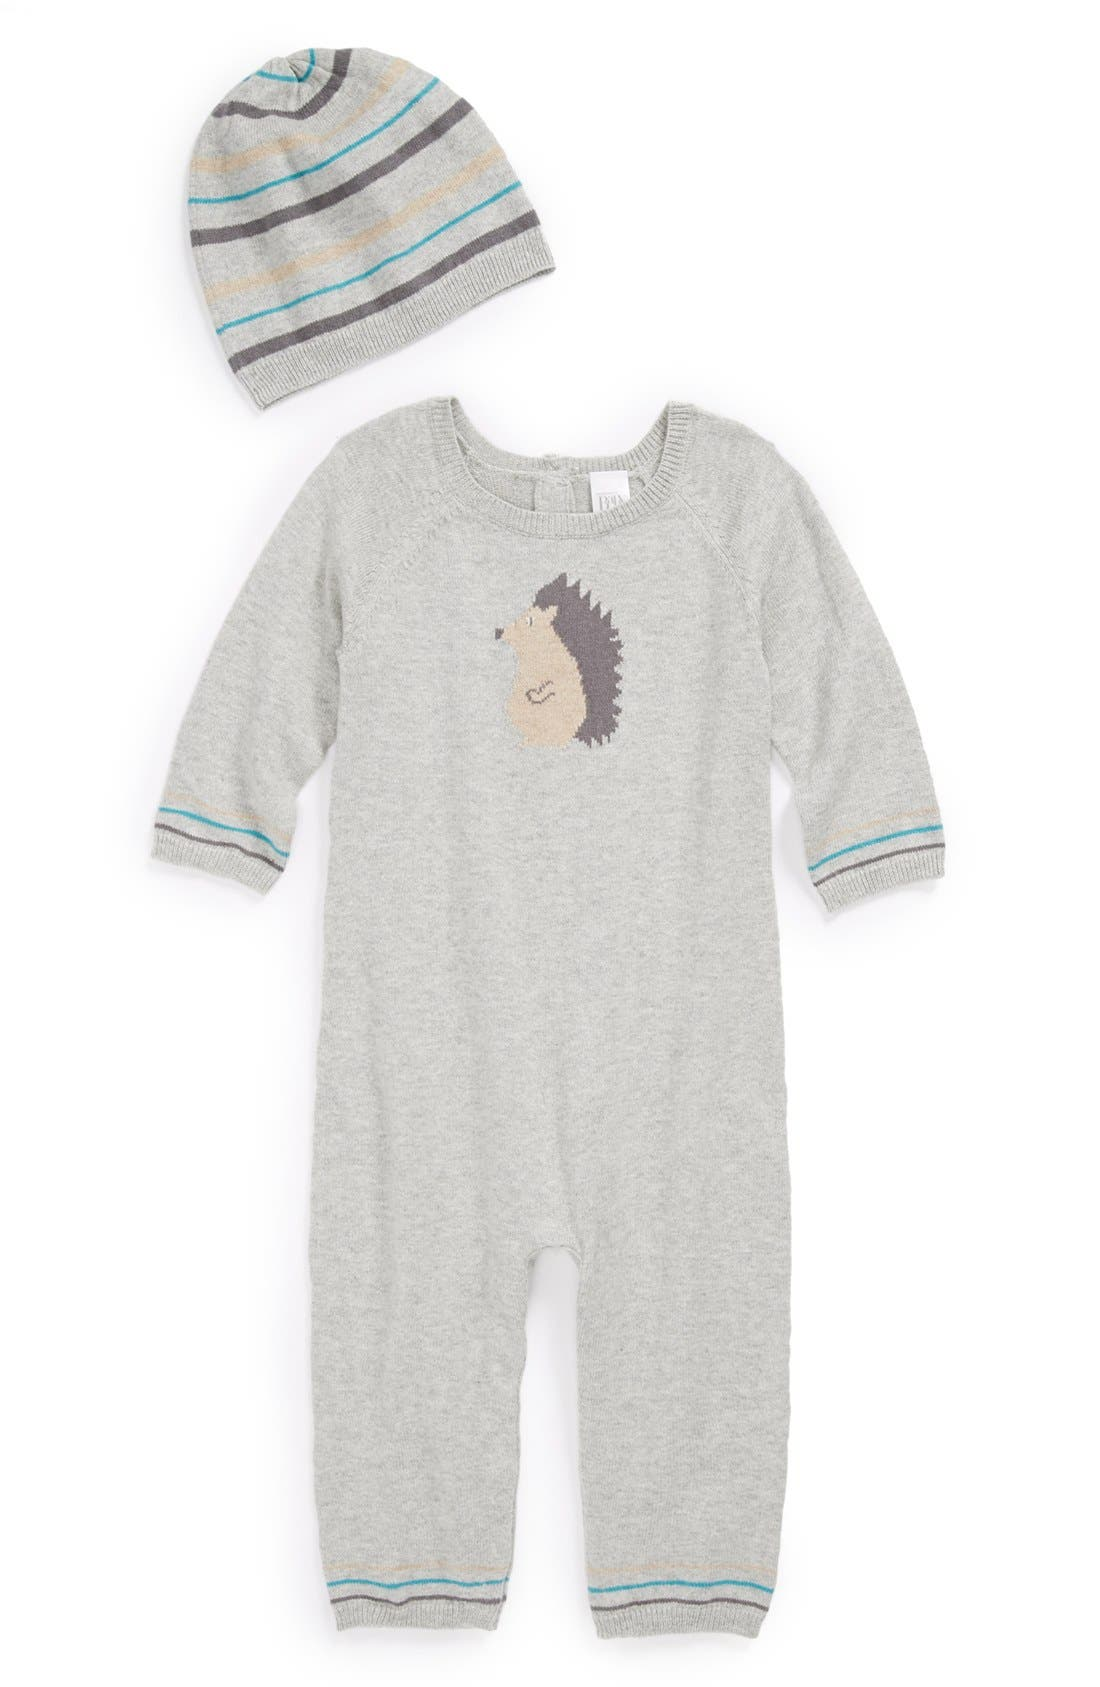 Main Image - Nordstrom Baby Romper & Hat (Baby Boys)